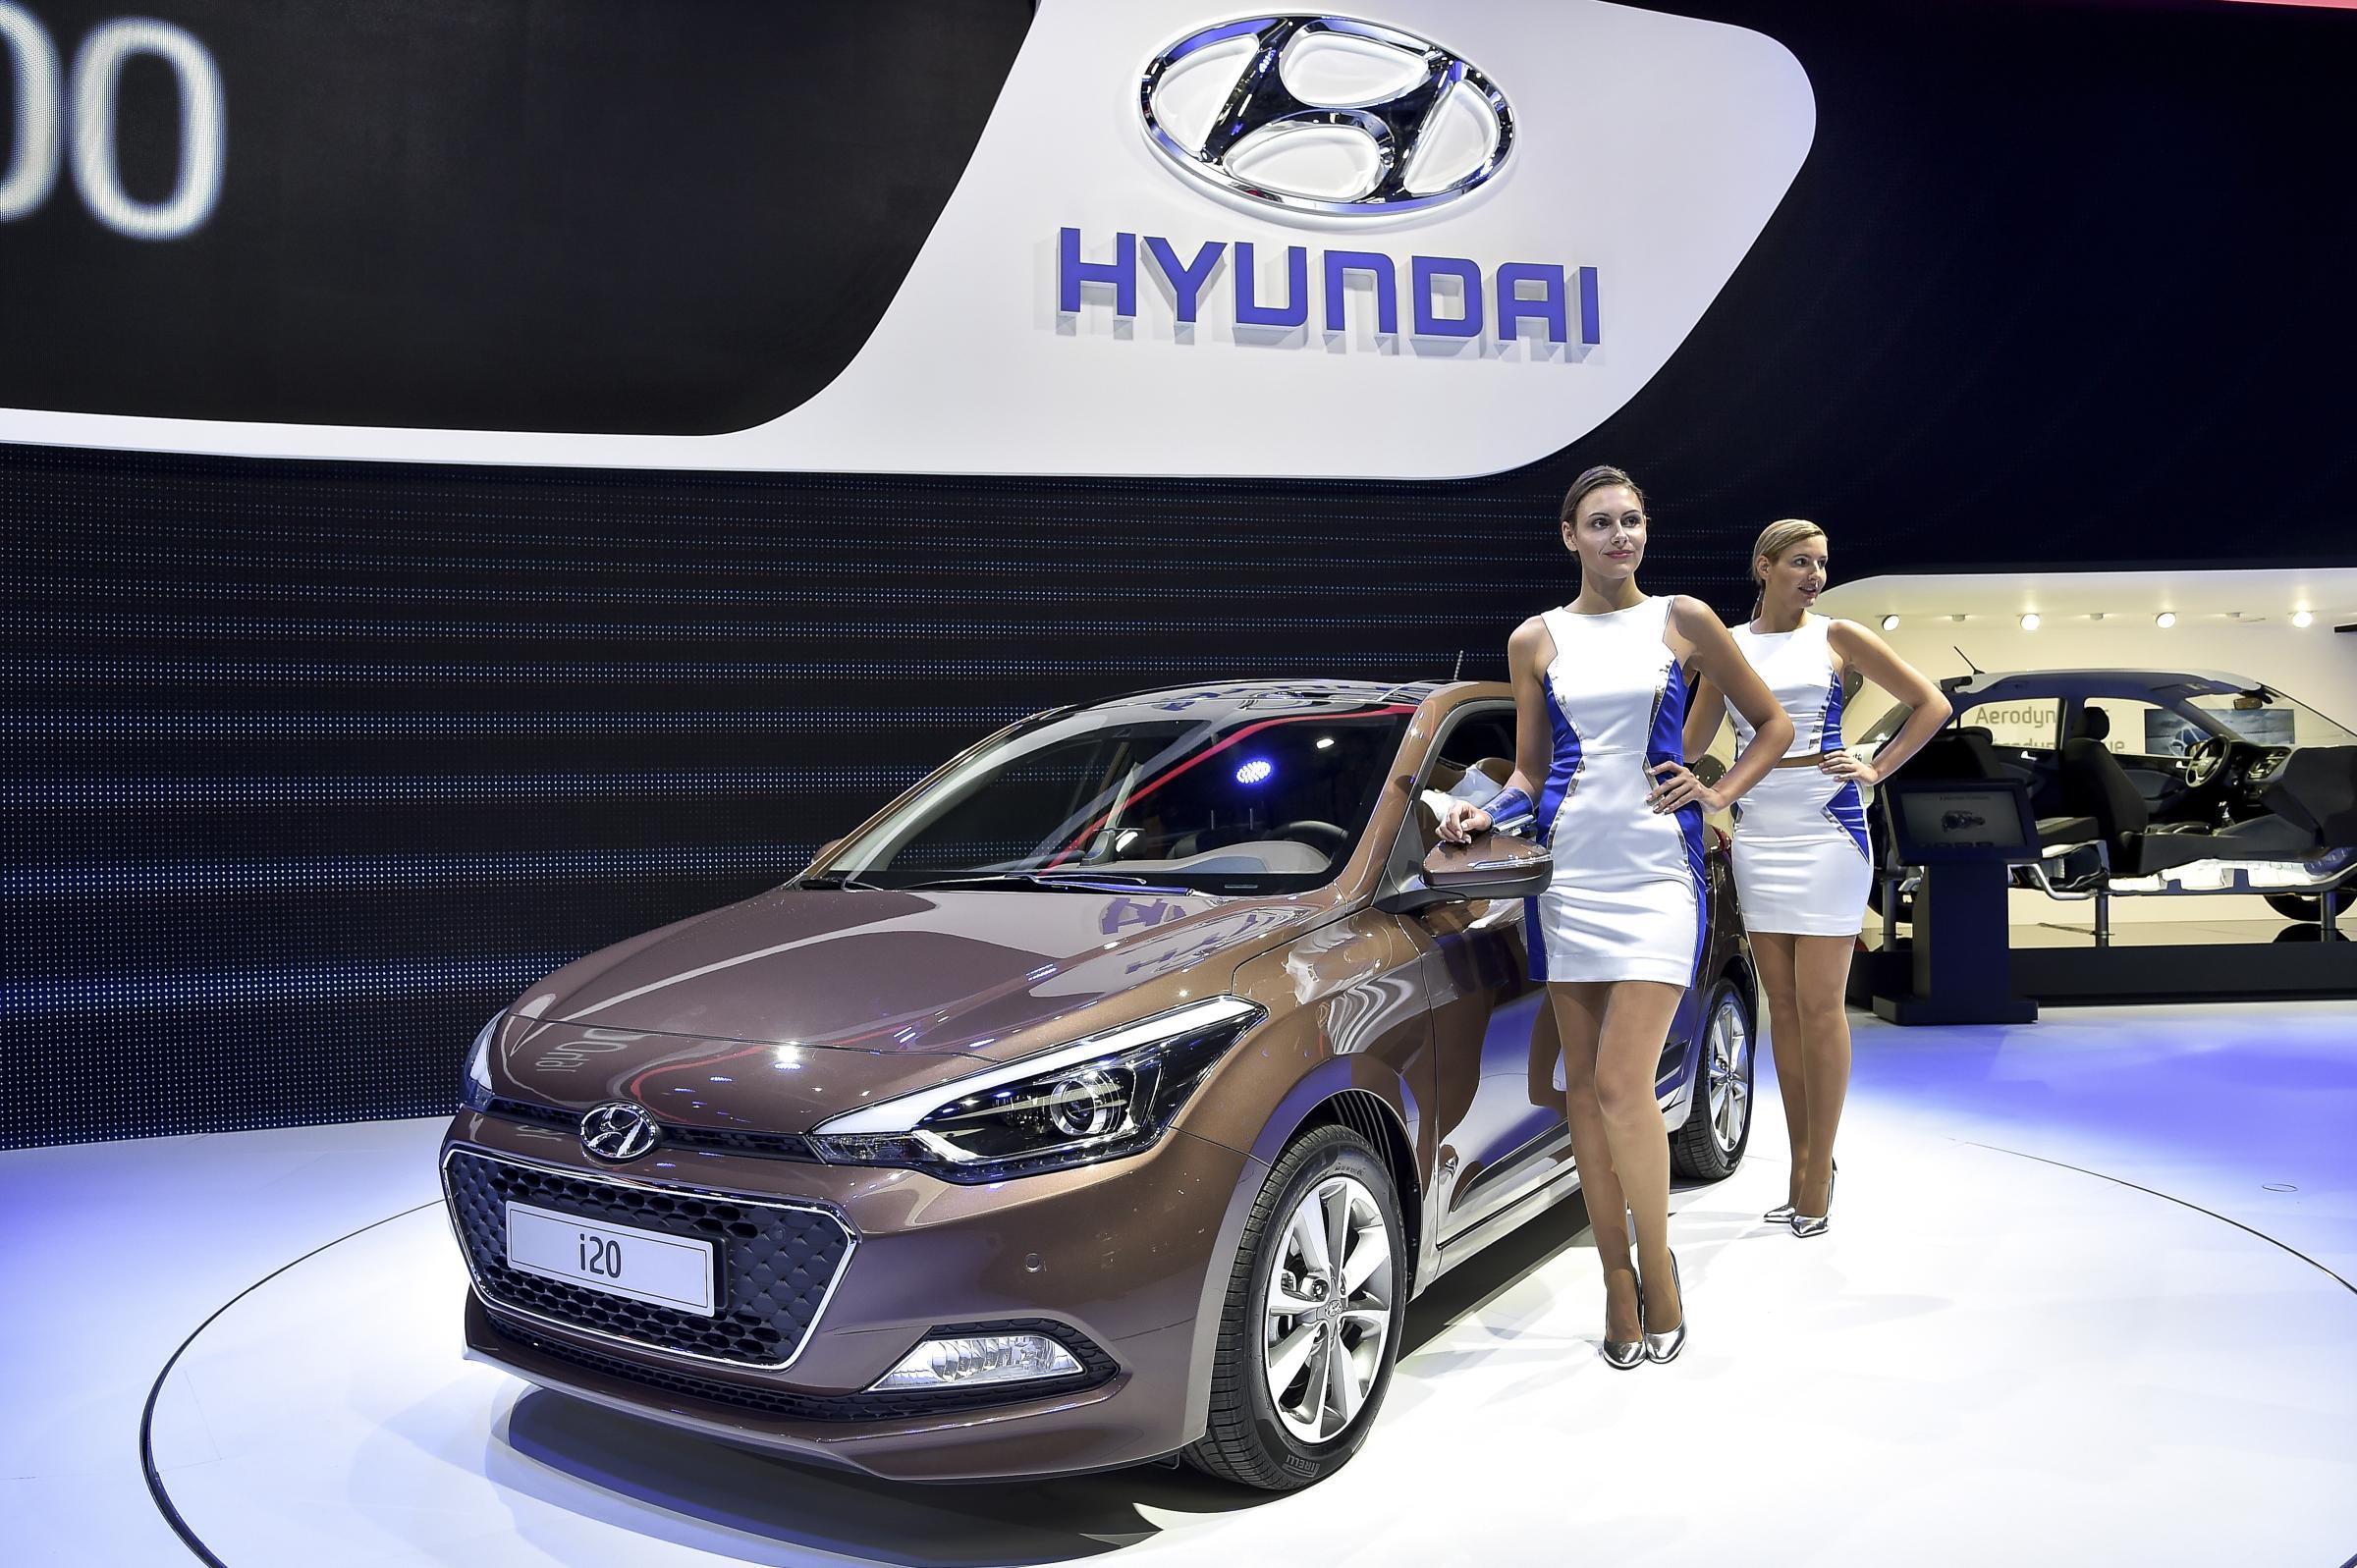 Hyundai i20 Nuova Generazione